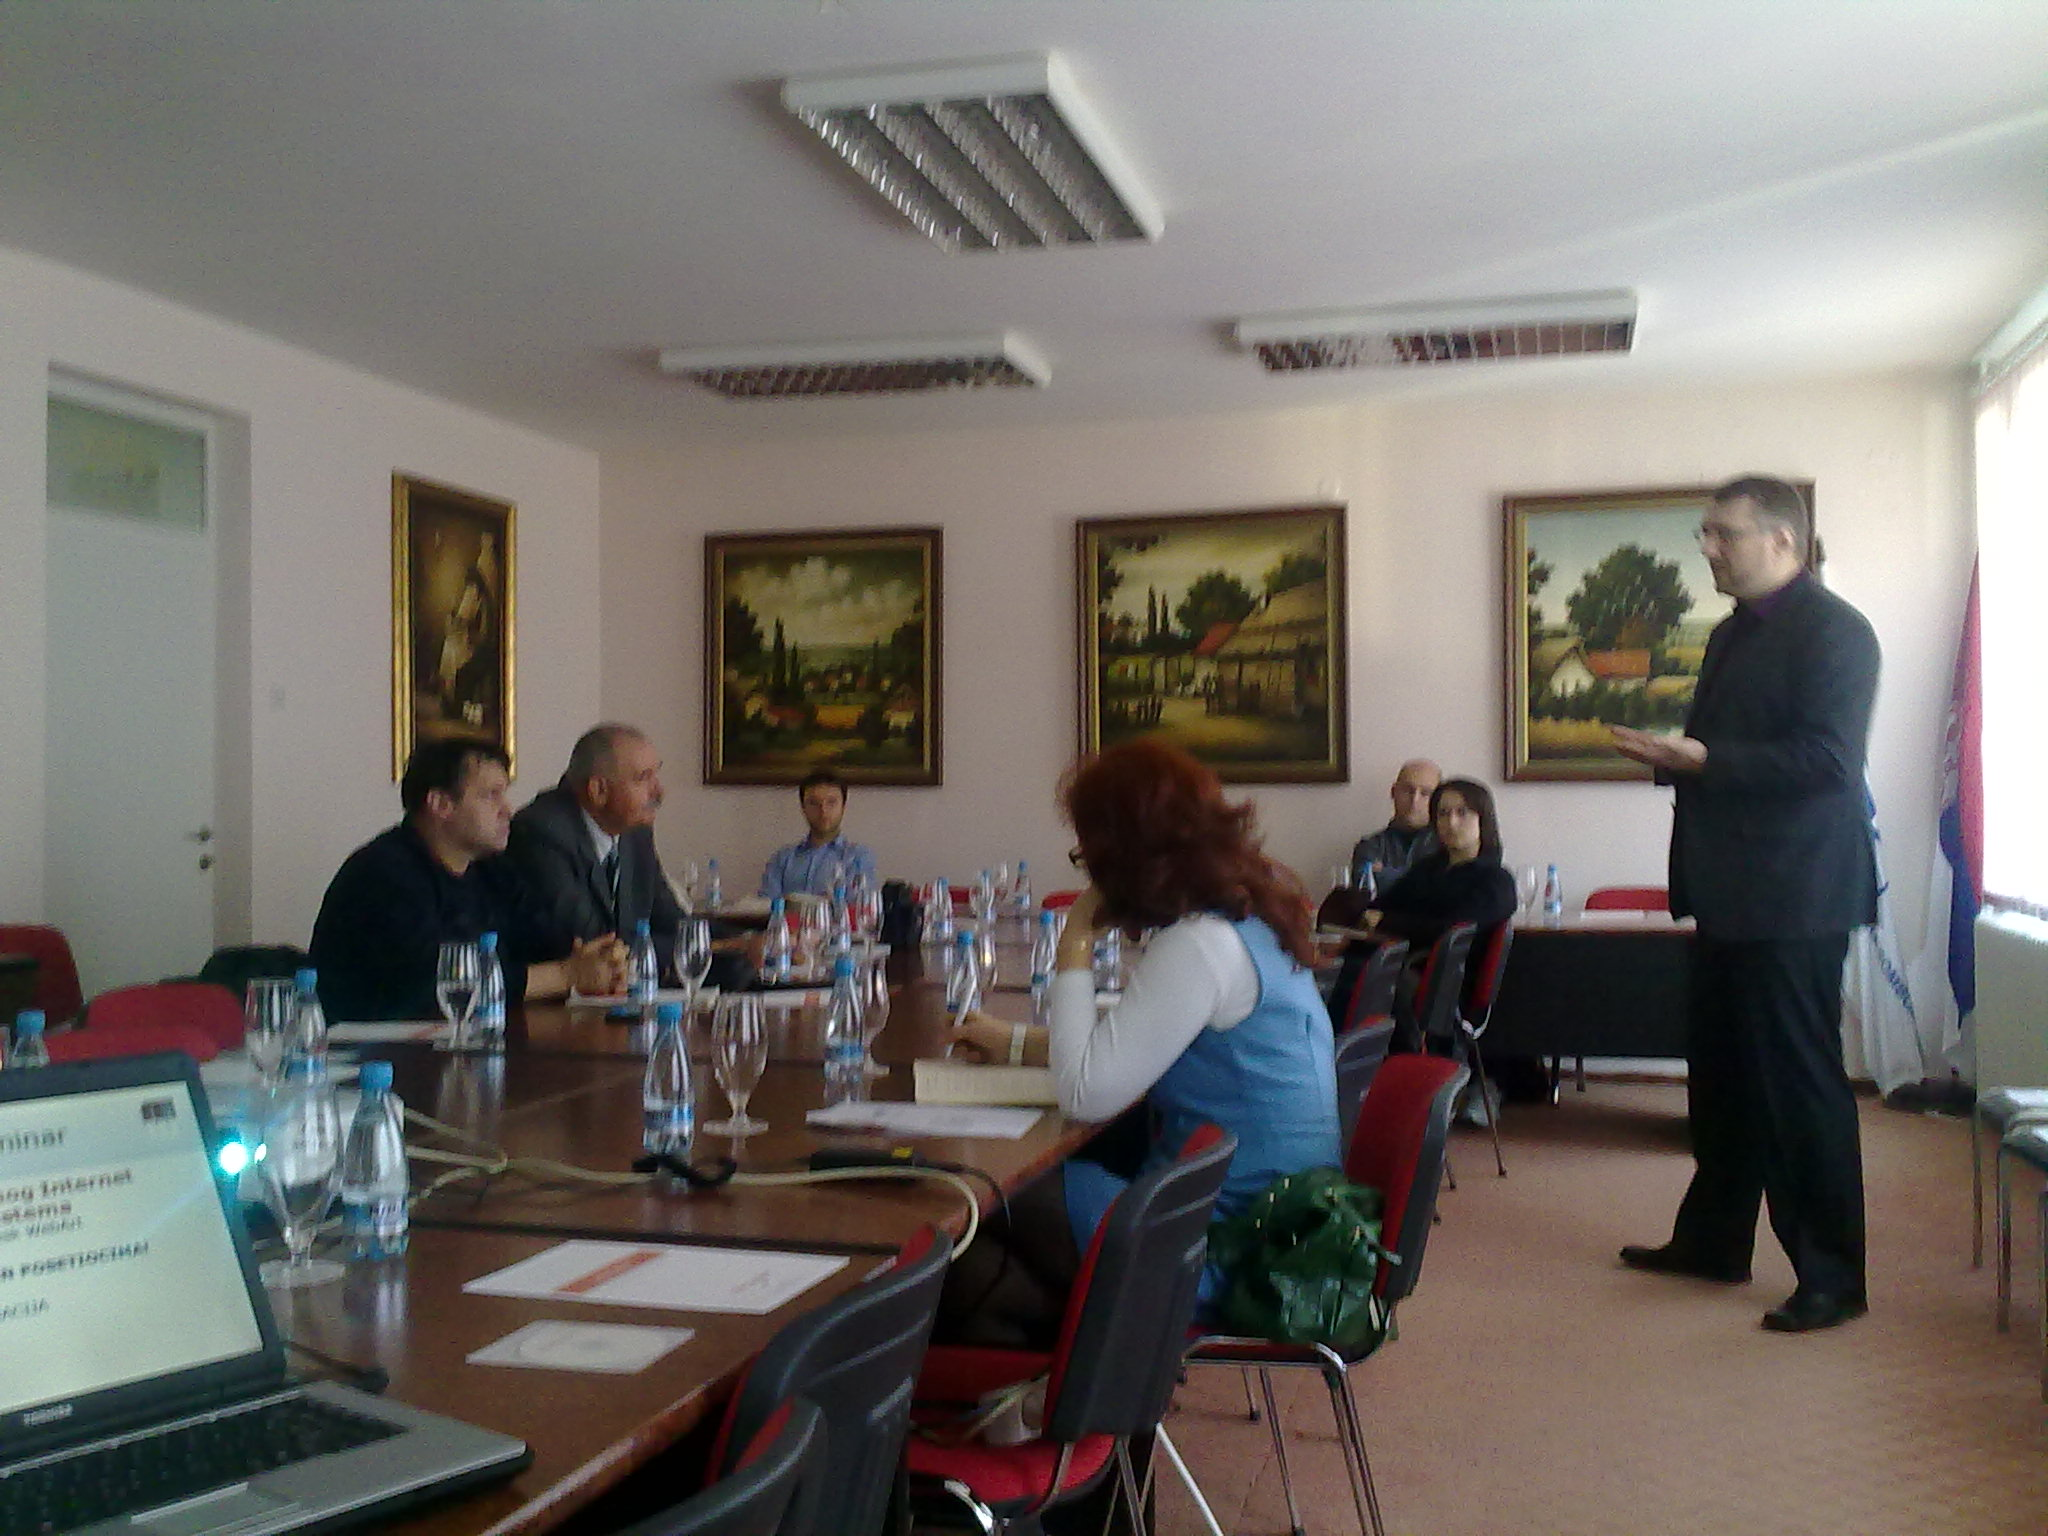 predavanje o internet poslovanju